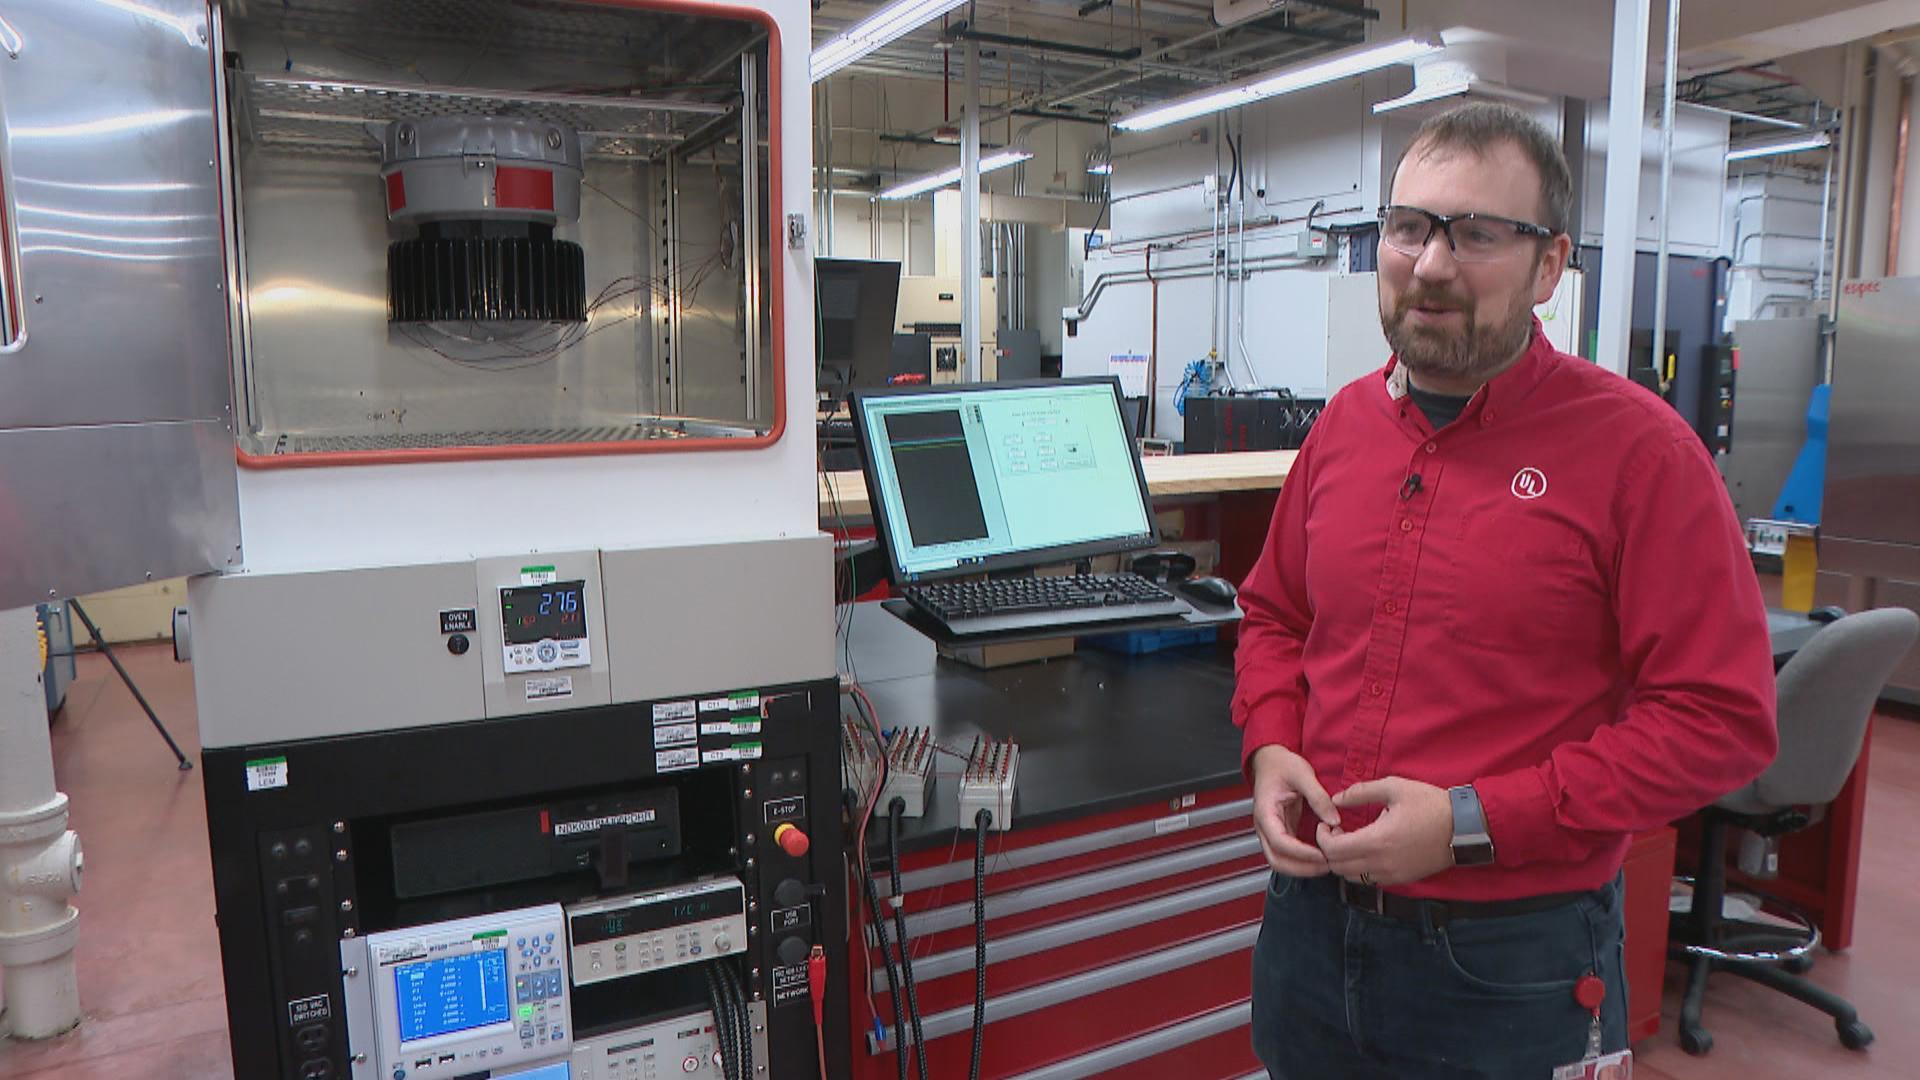 Bill Hoffman, laboratory leader for UL (Underwriters Laboratories) hazardous locations facility in Northbrook. (WTTW News)